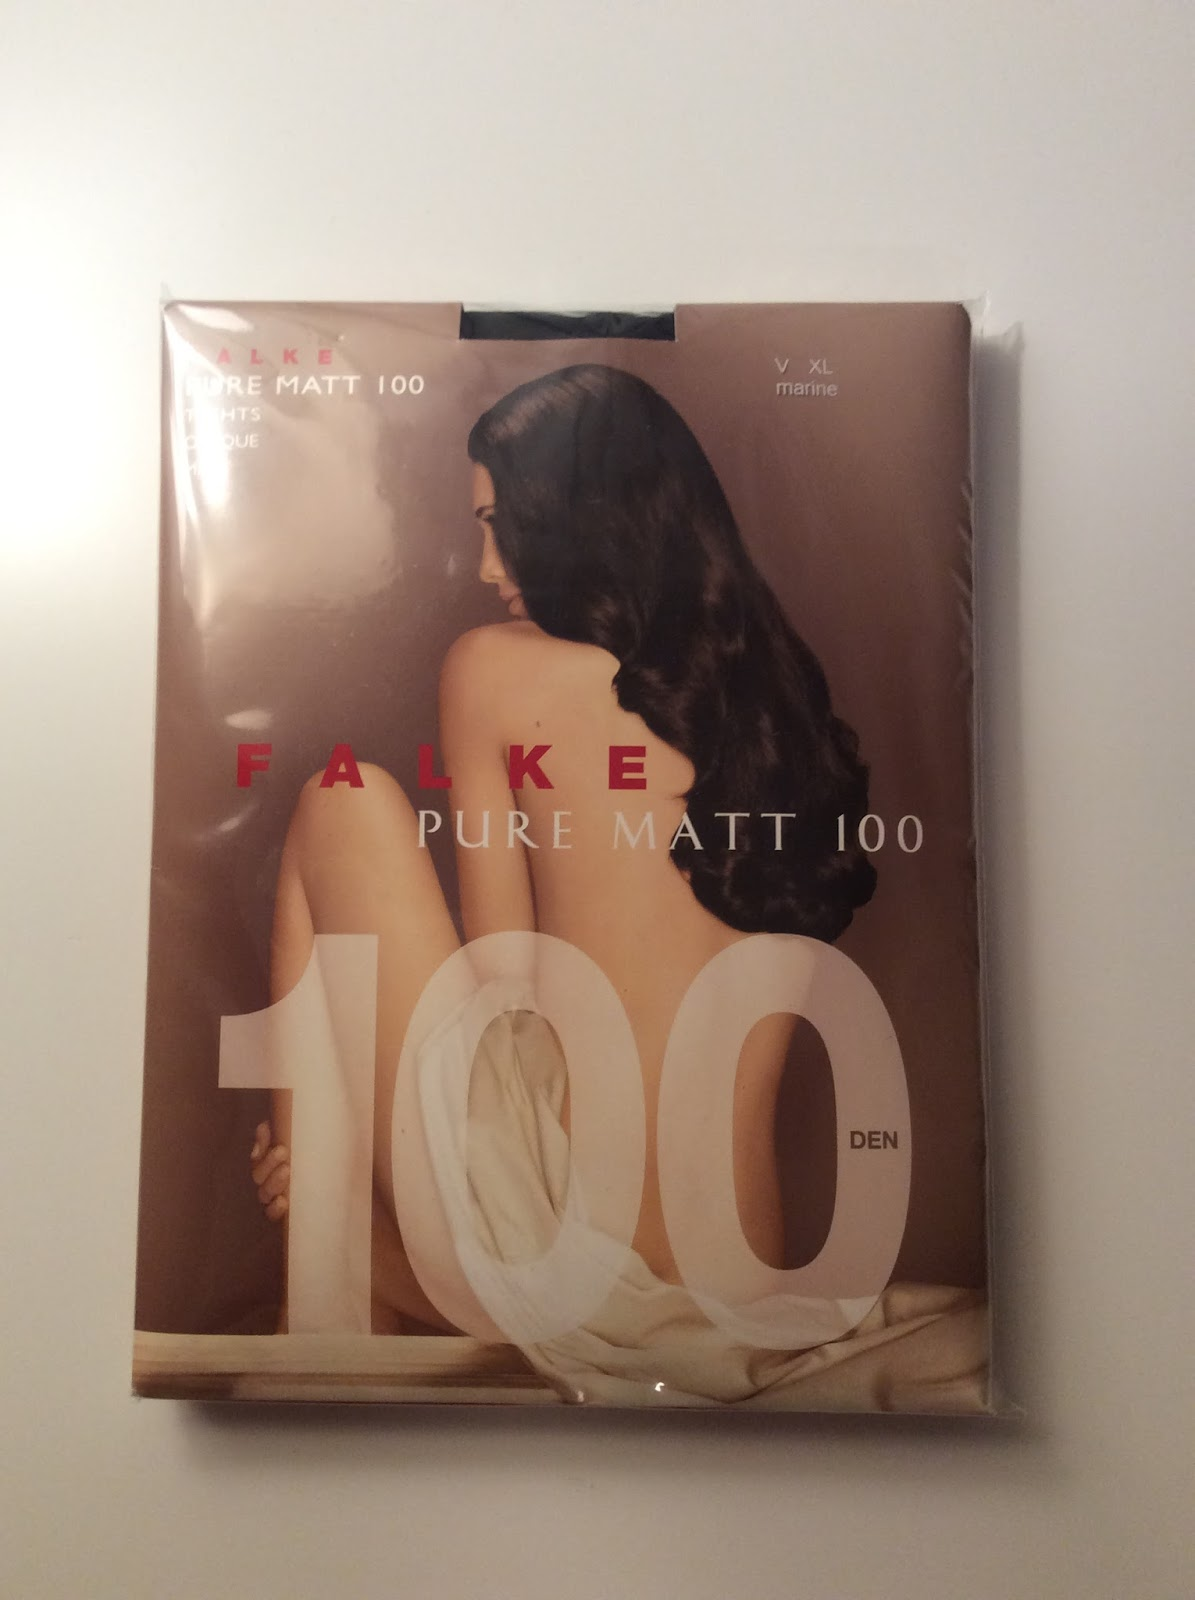 e36a04319df Hosiery For Men  Guest review  Falke Pure Matt 100 Opaque Tights